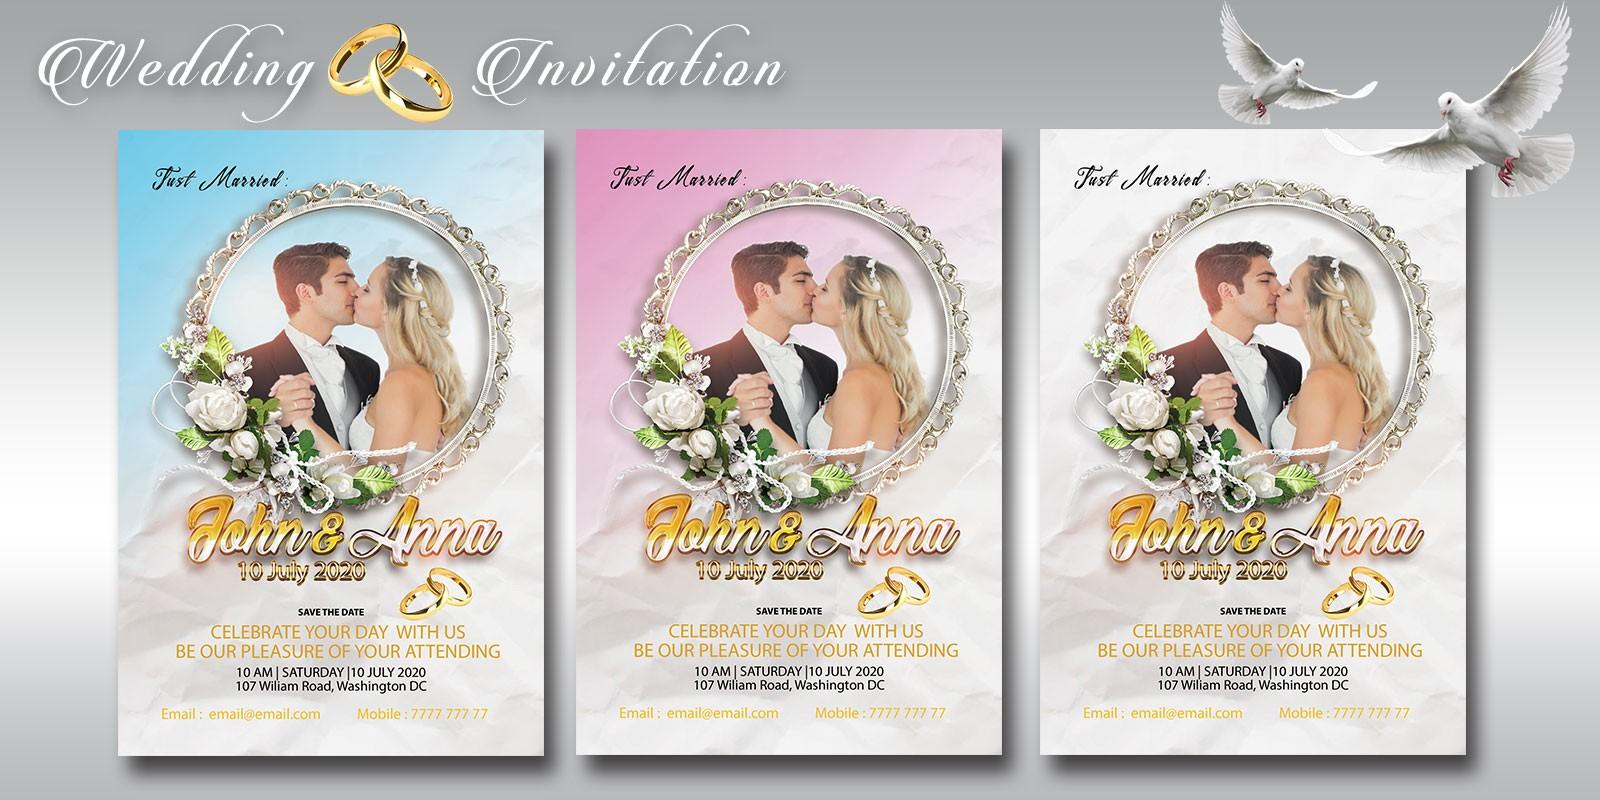 wedding invitation flyer miscellaneous print templates codester. Black Bedroom Furniture Sets. Home Design Ideas